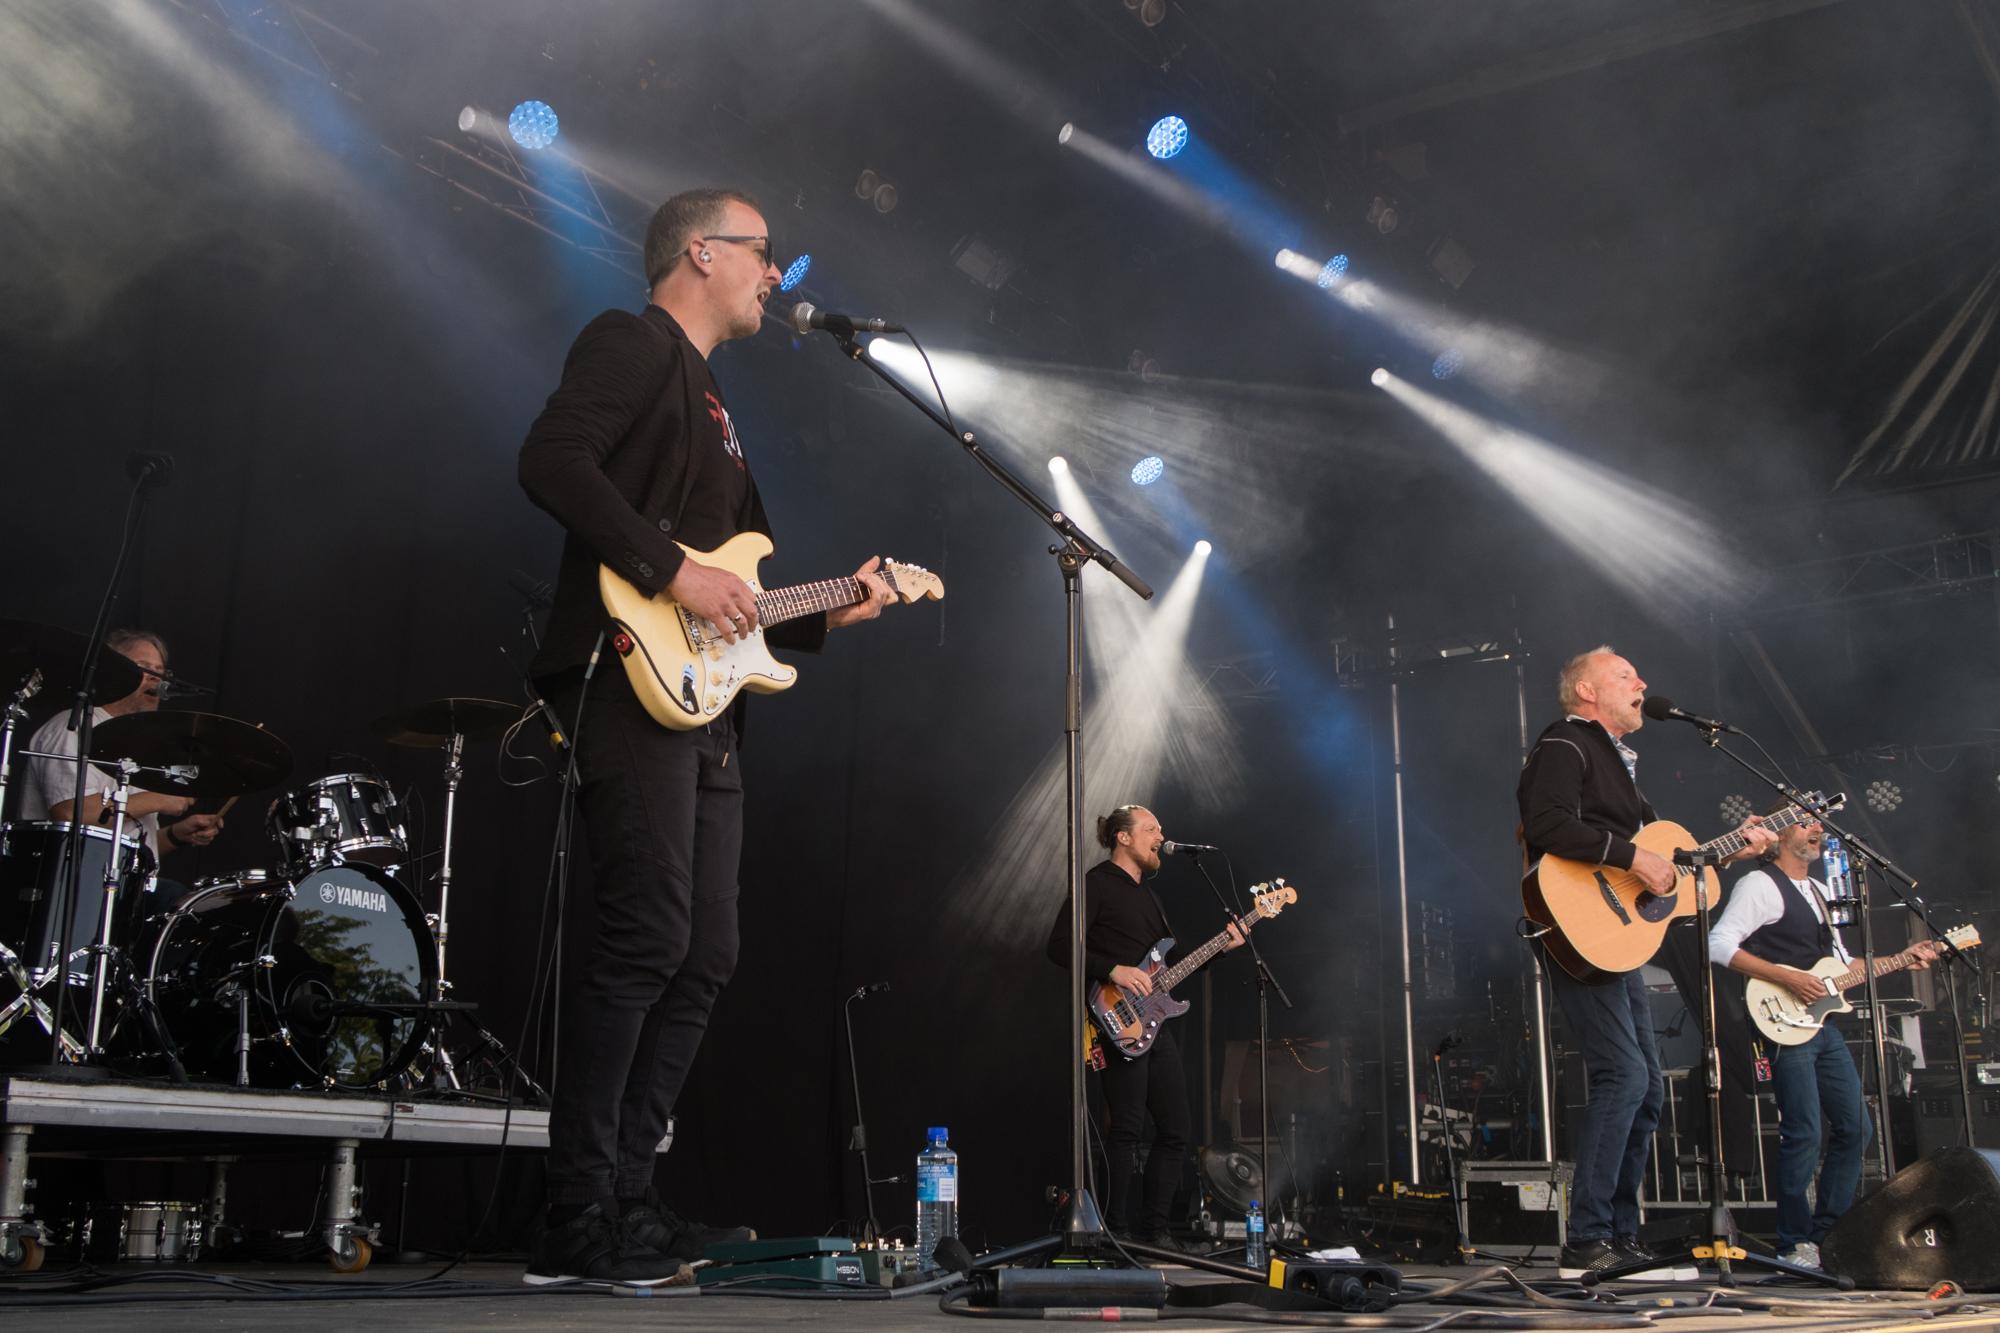 roots-2019-halvdan-sivertsen-9